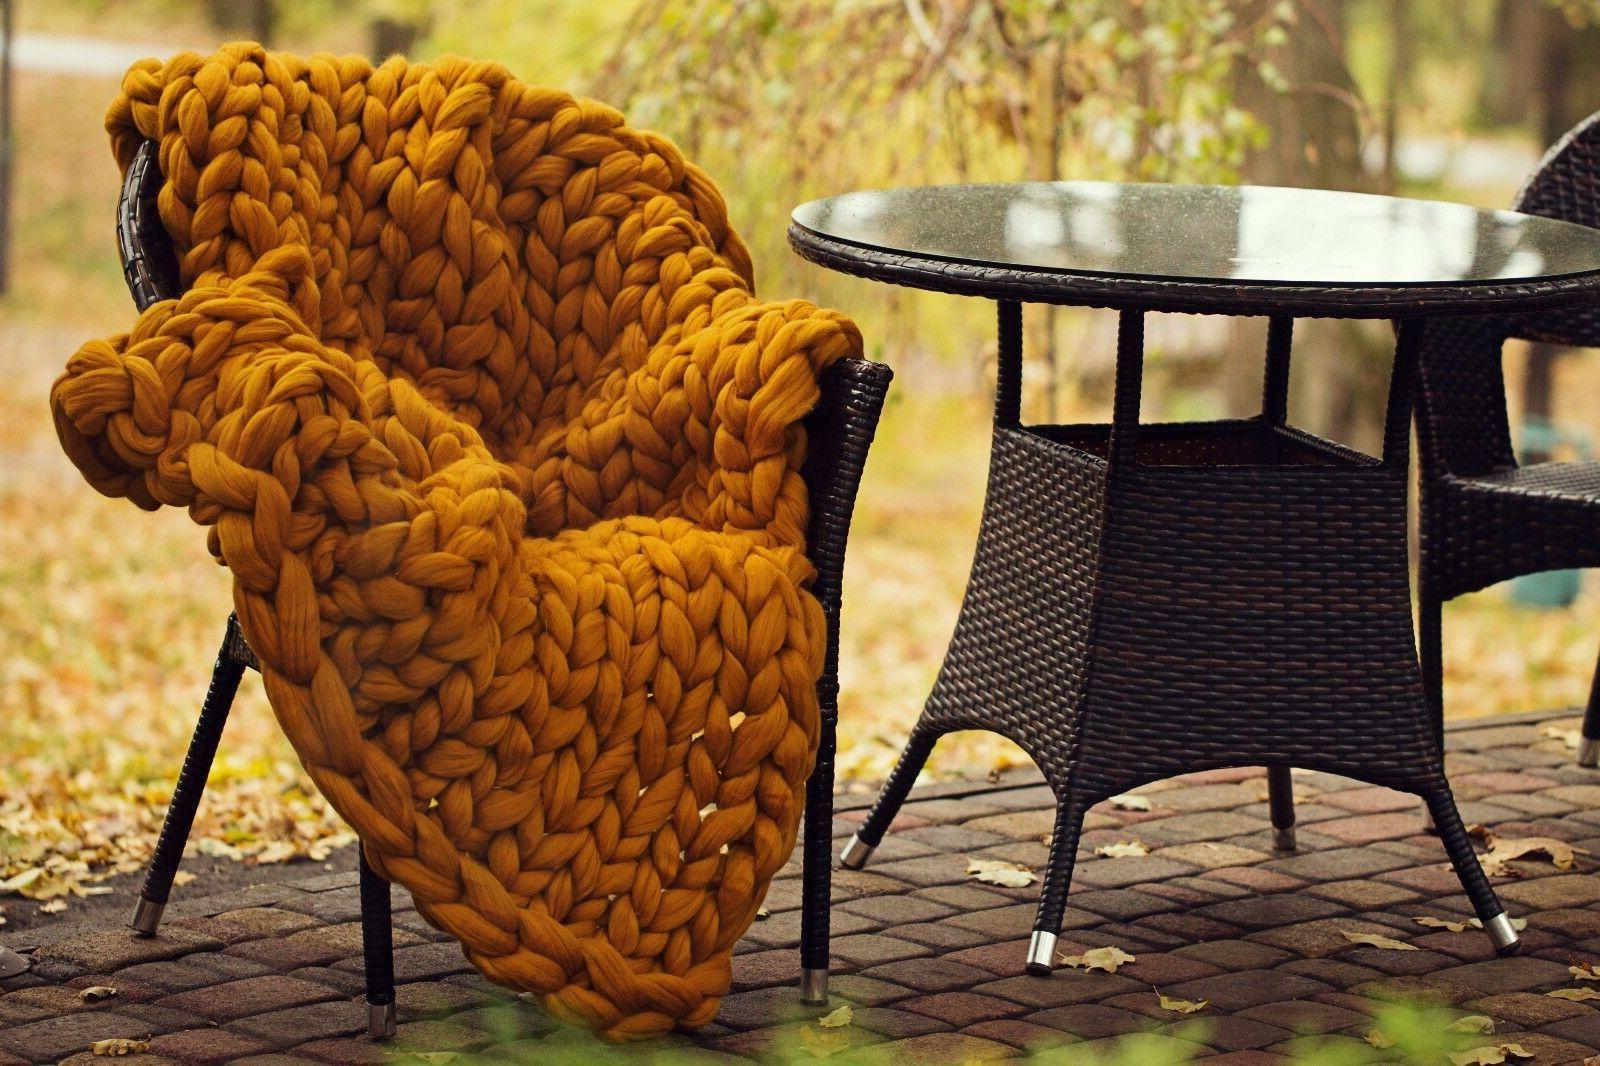 Chunky Knit Blanket 100% Merino Wool Throw Arm Knitted Blanket